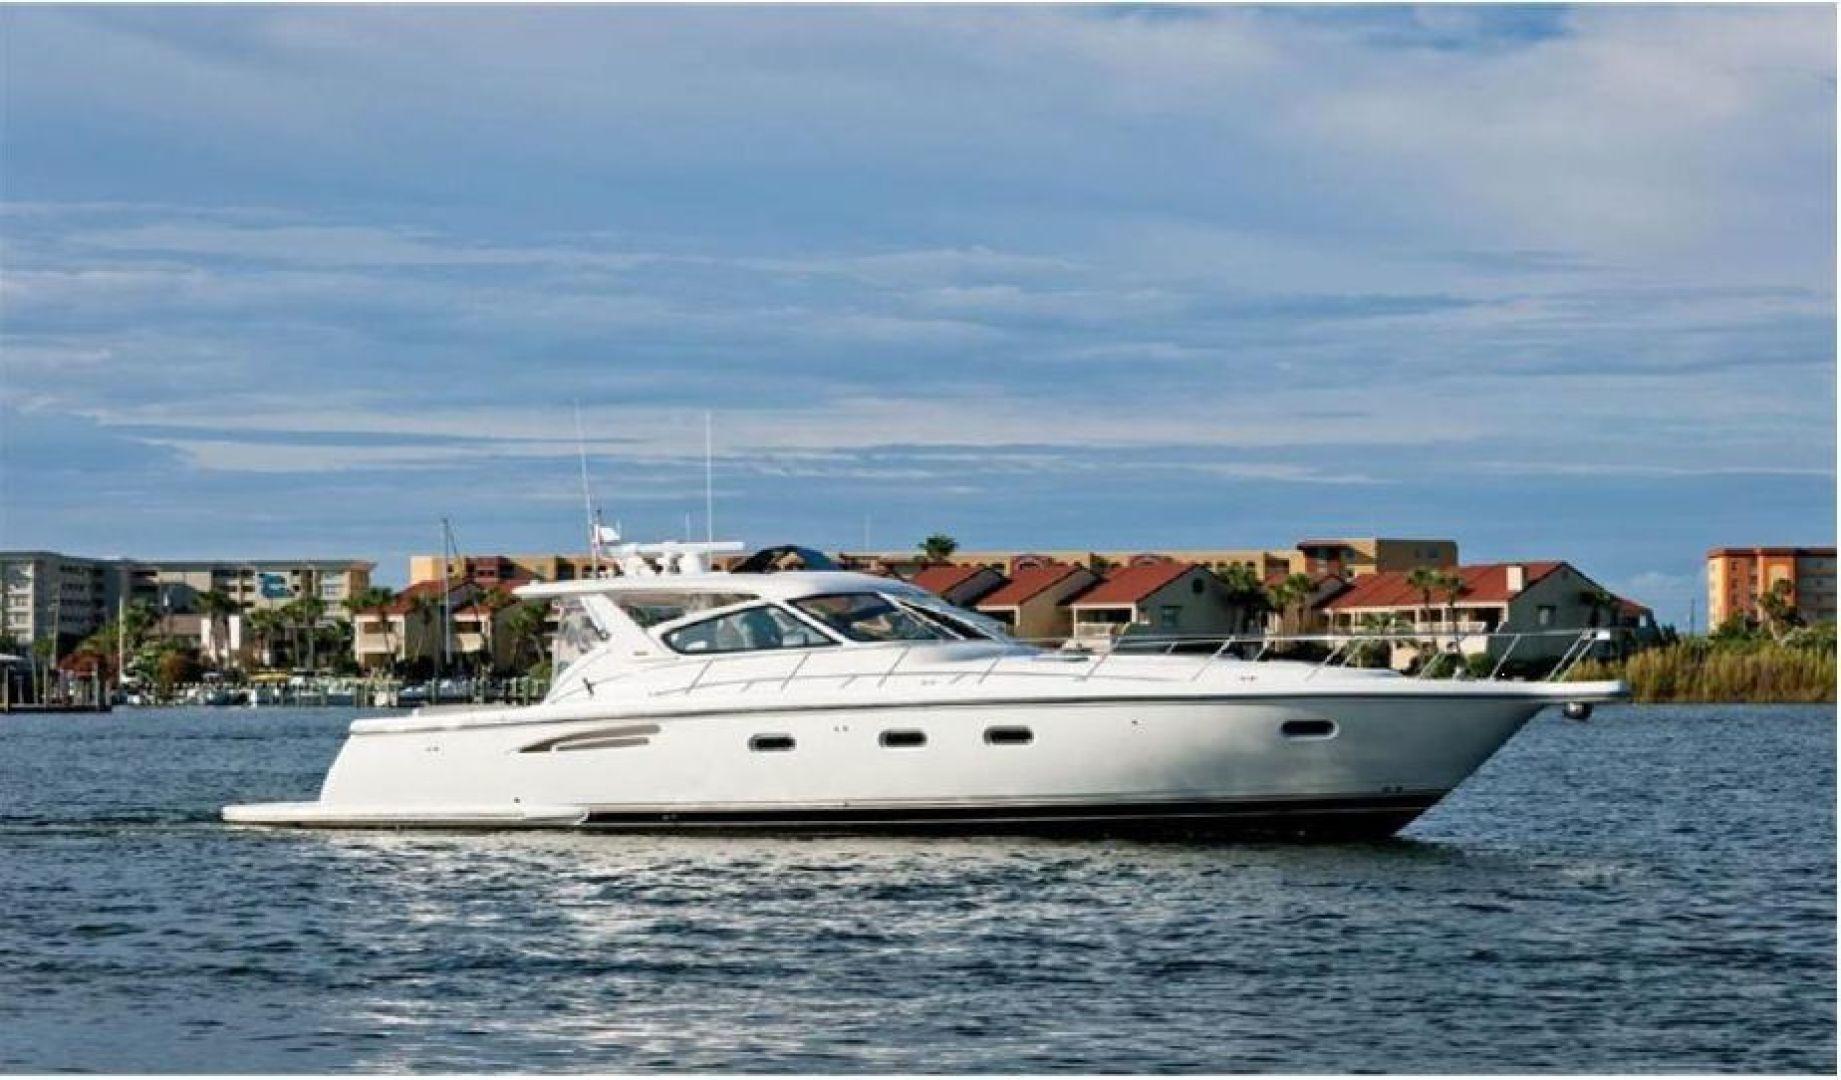 52' Tiara Yachts 1999 Express Jonny's Quest